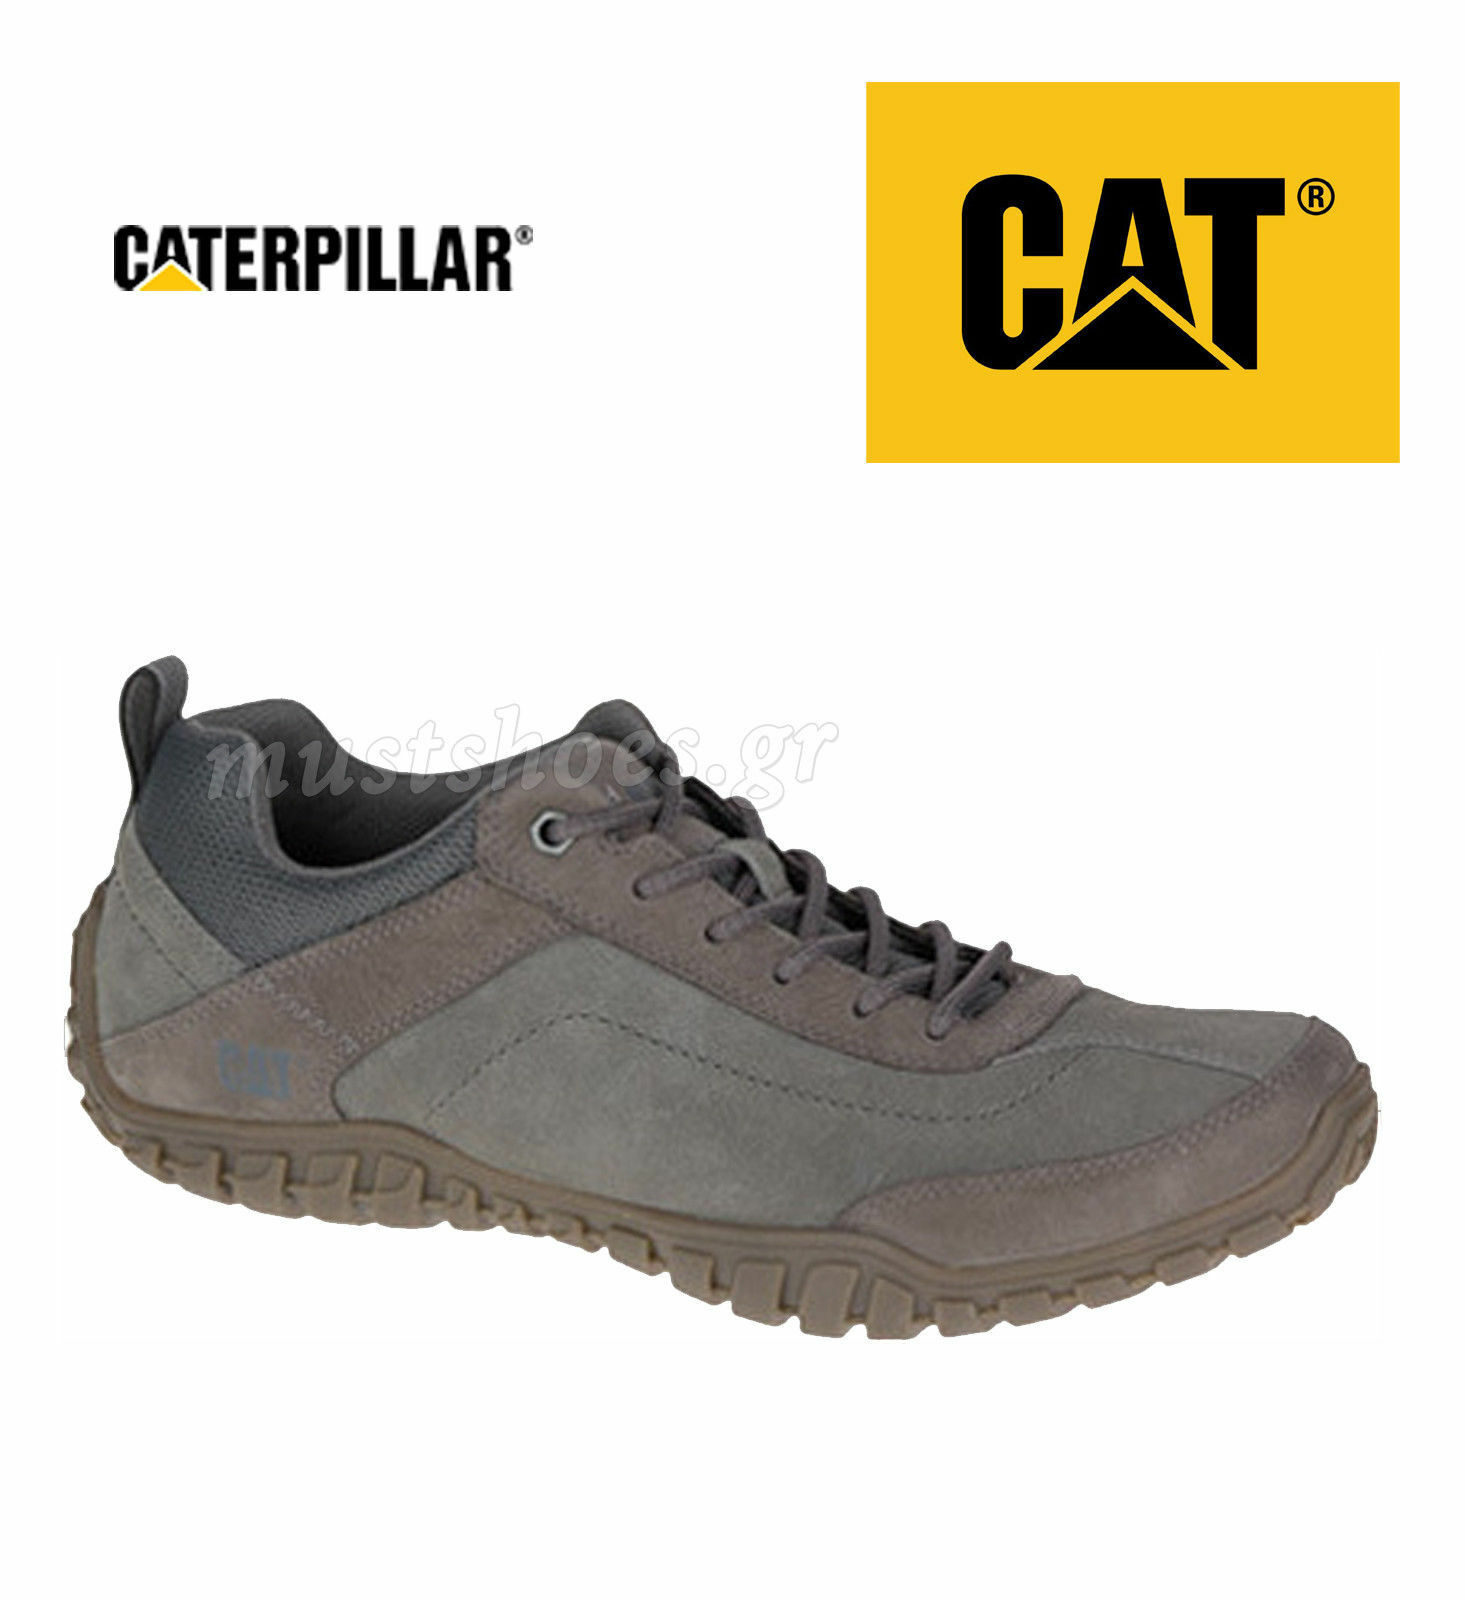 CATERPILLAR CAT 721361 ARISE MEDIUM CHARCOAL EU 40, 41, 42, 44, 45